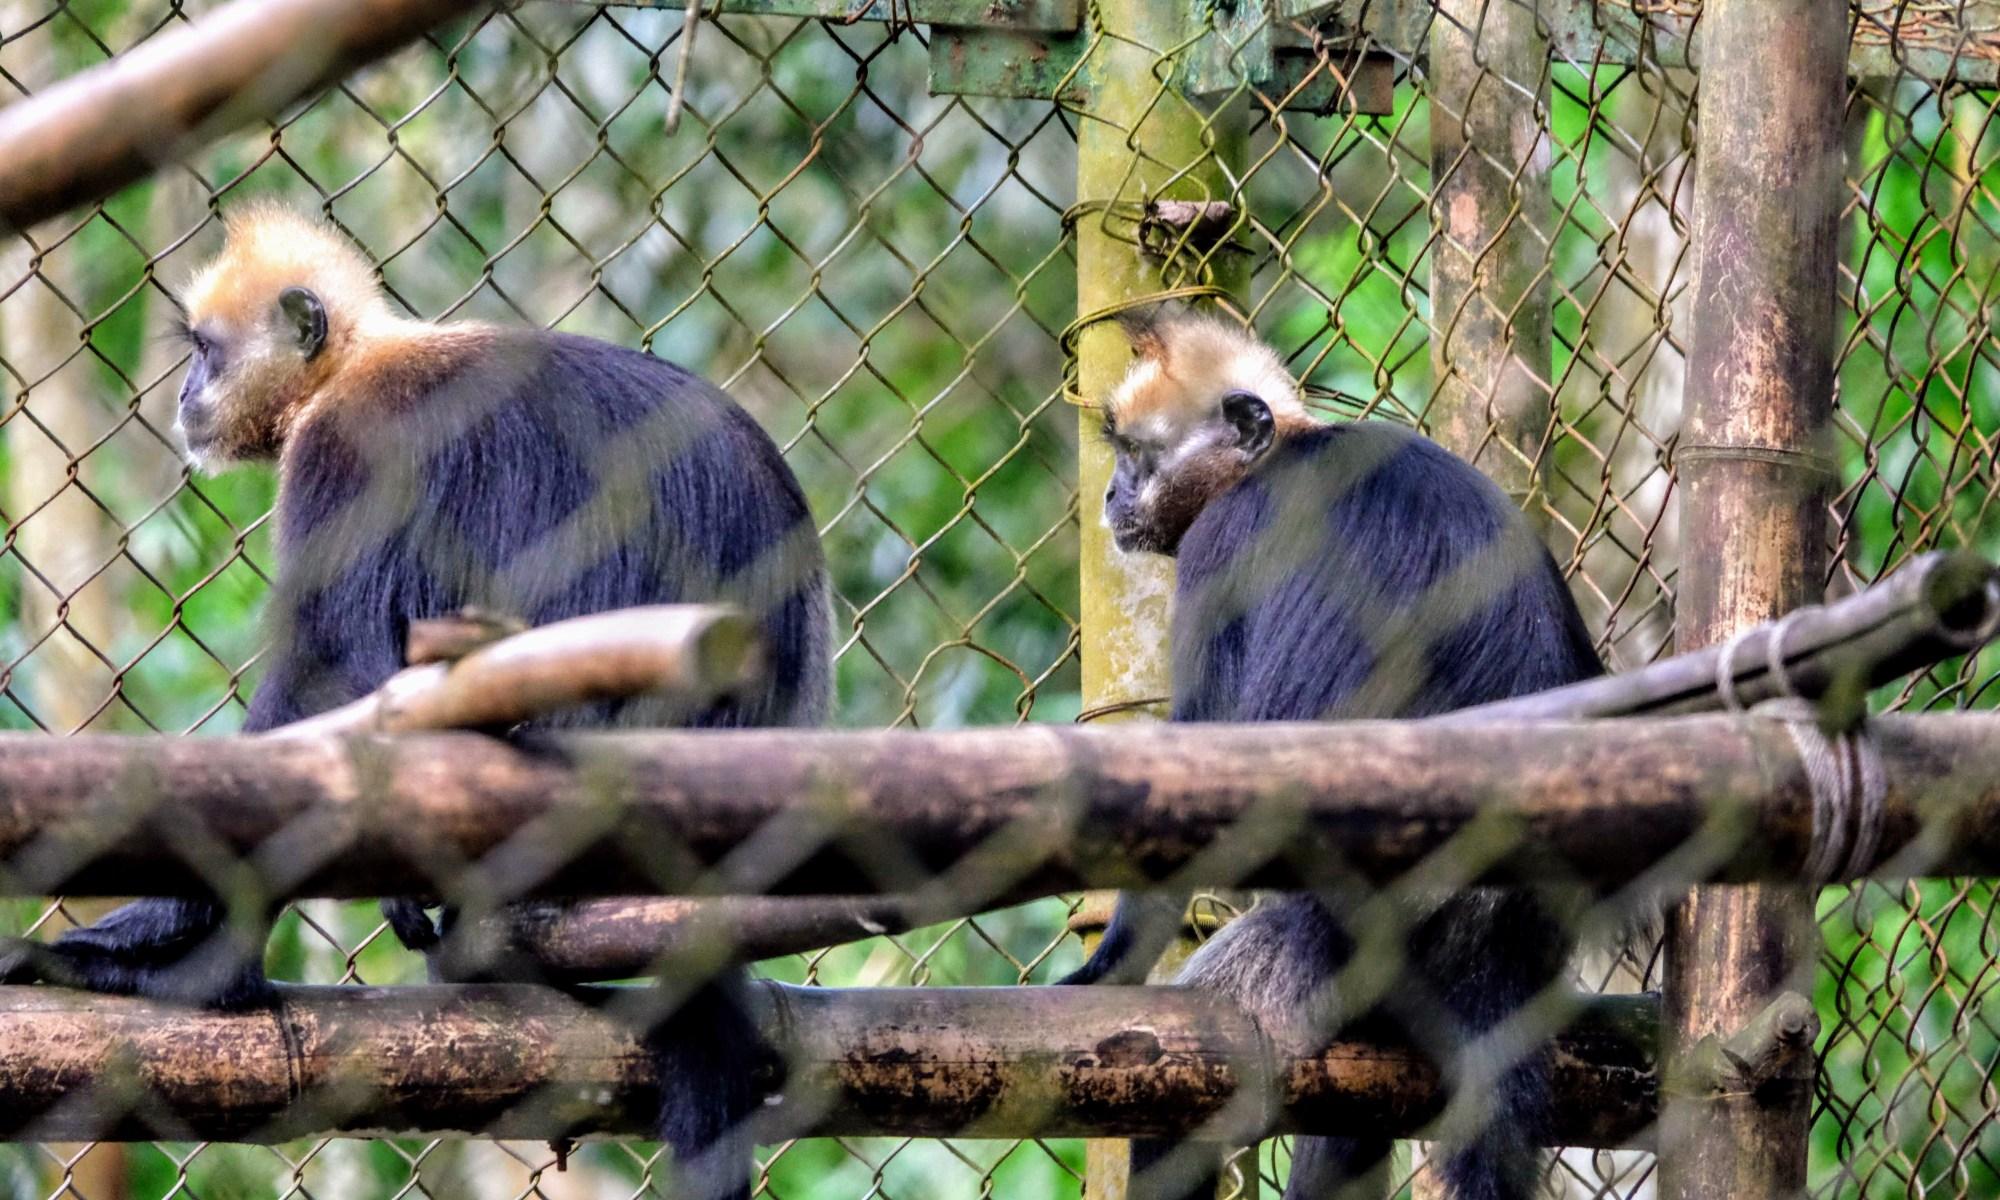 Cat Ba langurs in a primate rescue centre, Vietnam